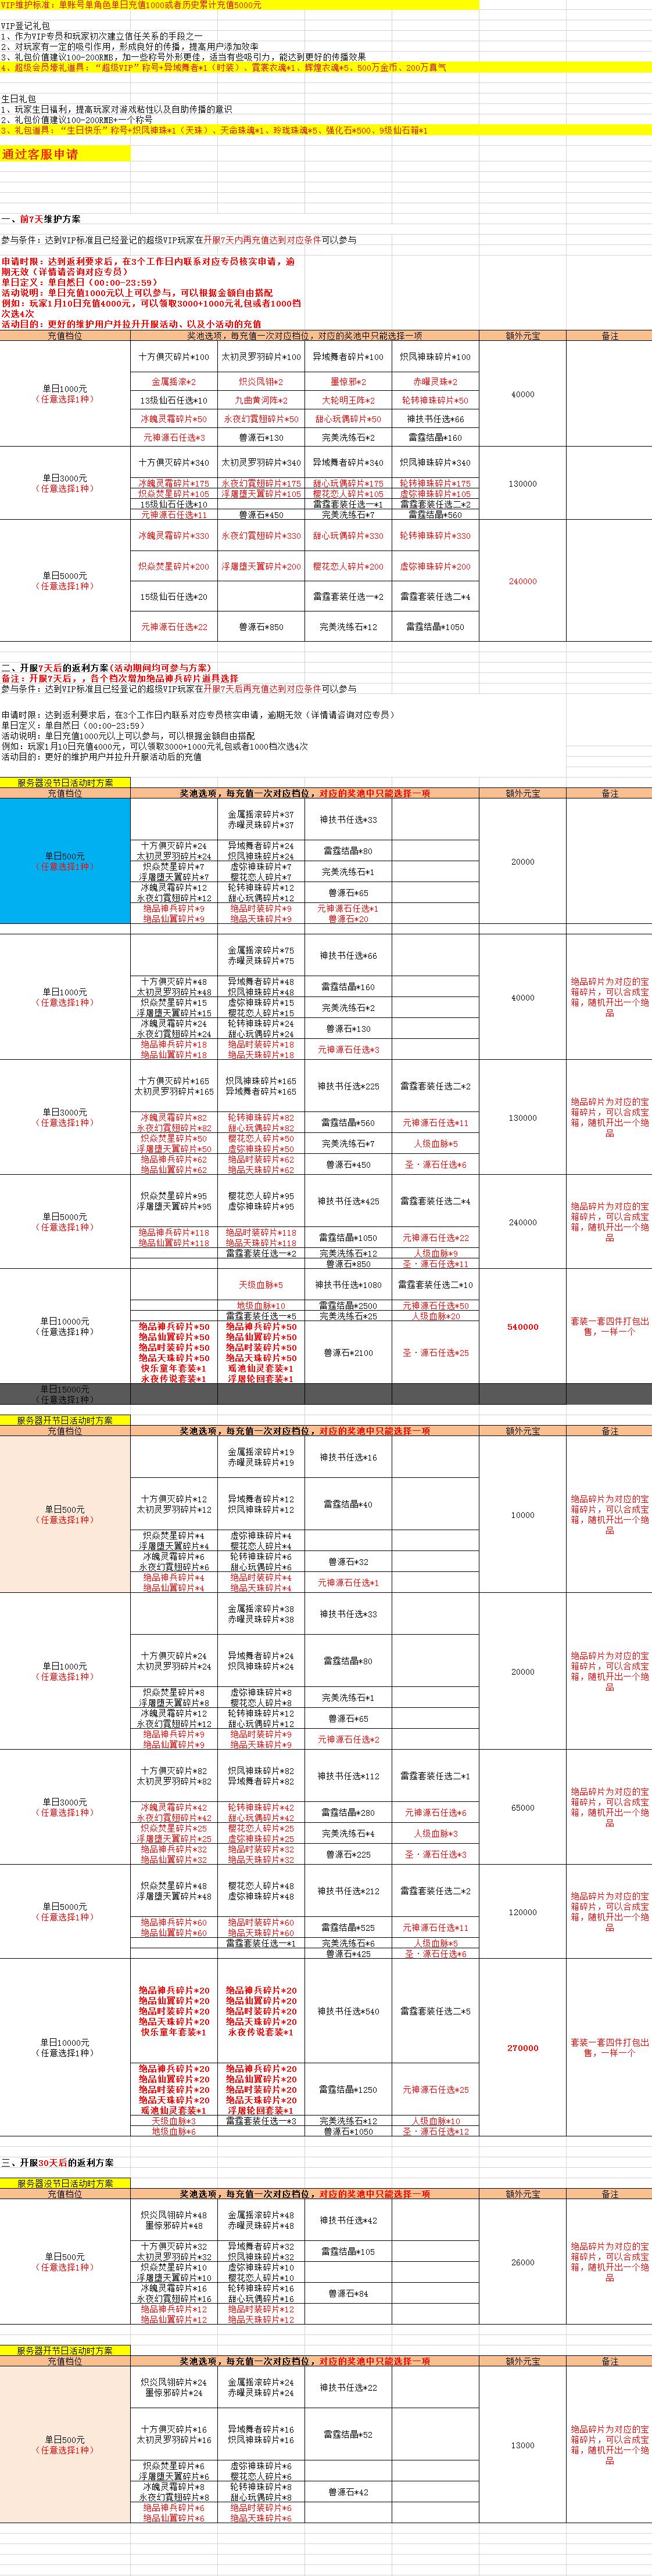 4LQIM}M39Q%QQDLG$]LIF8W.png